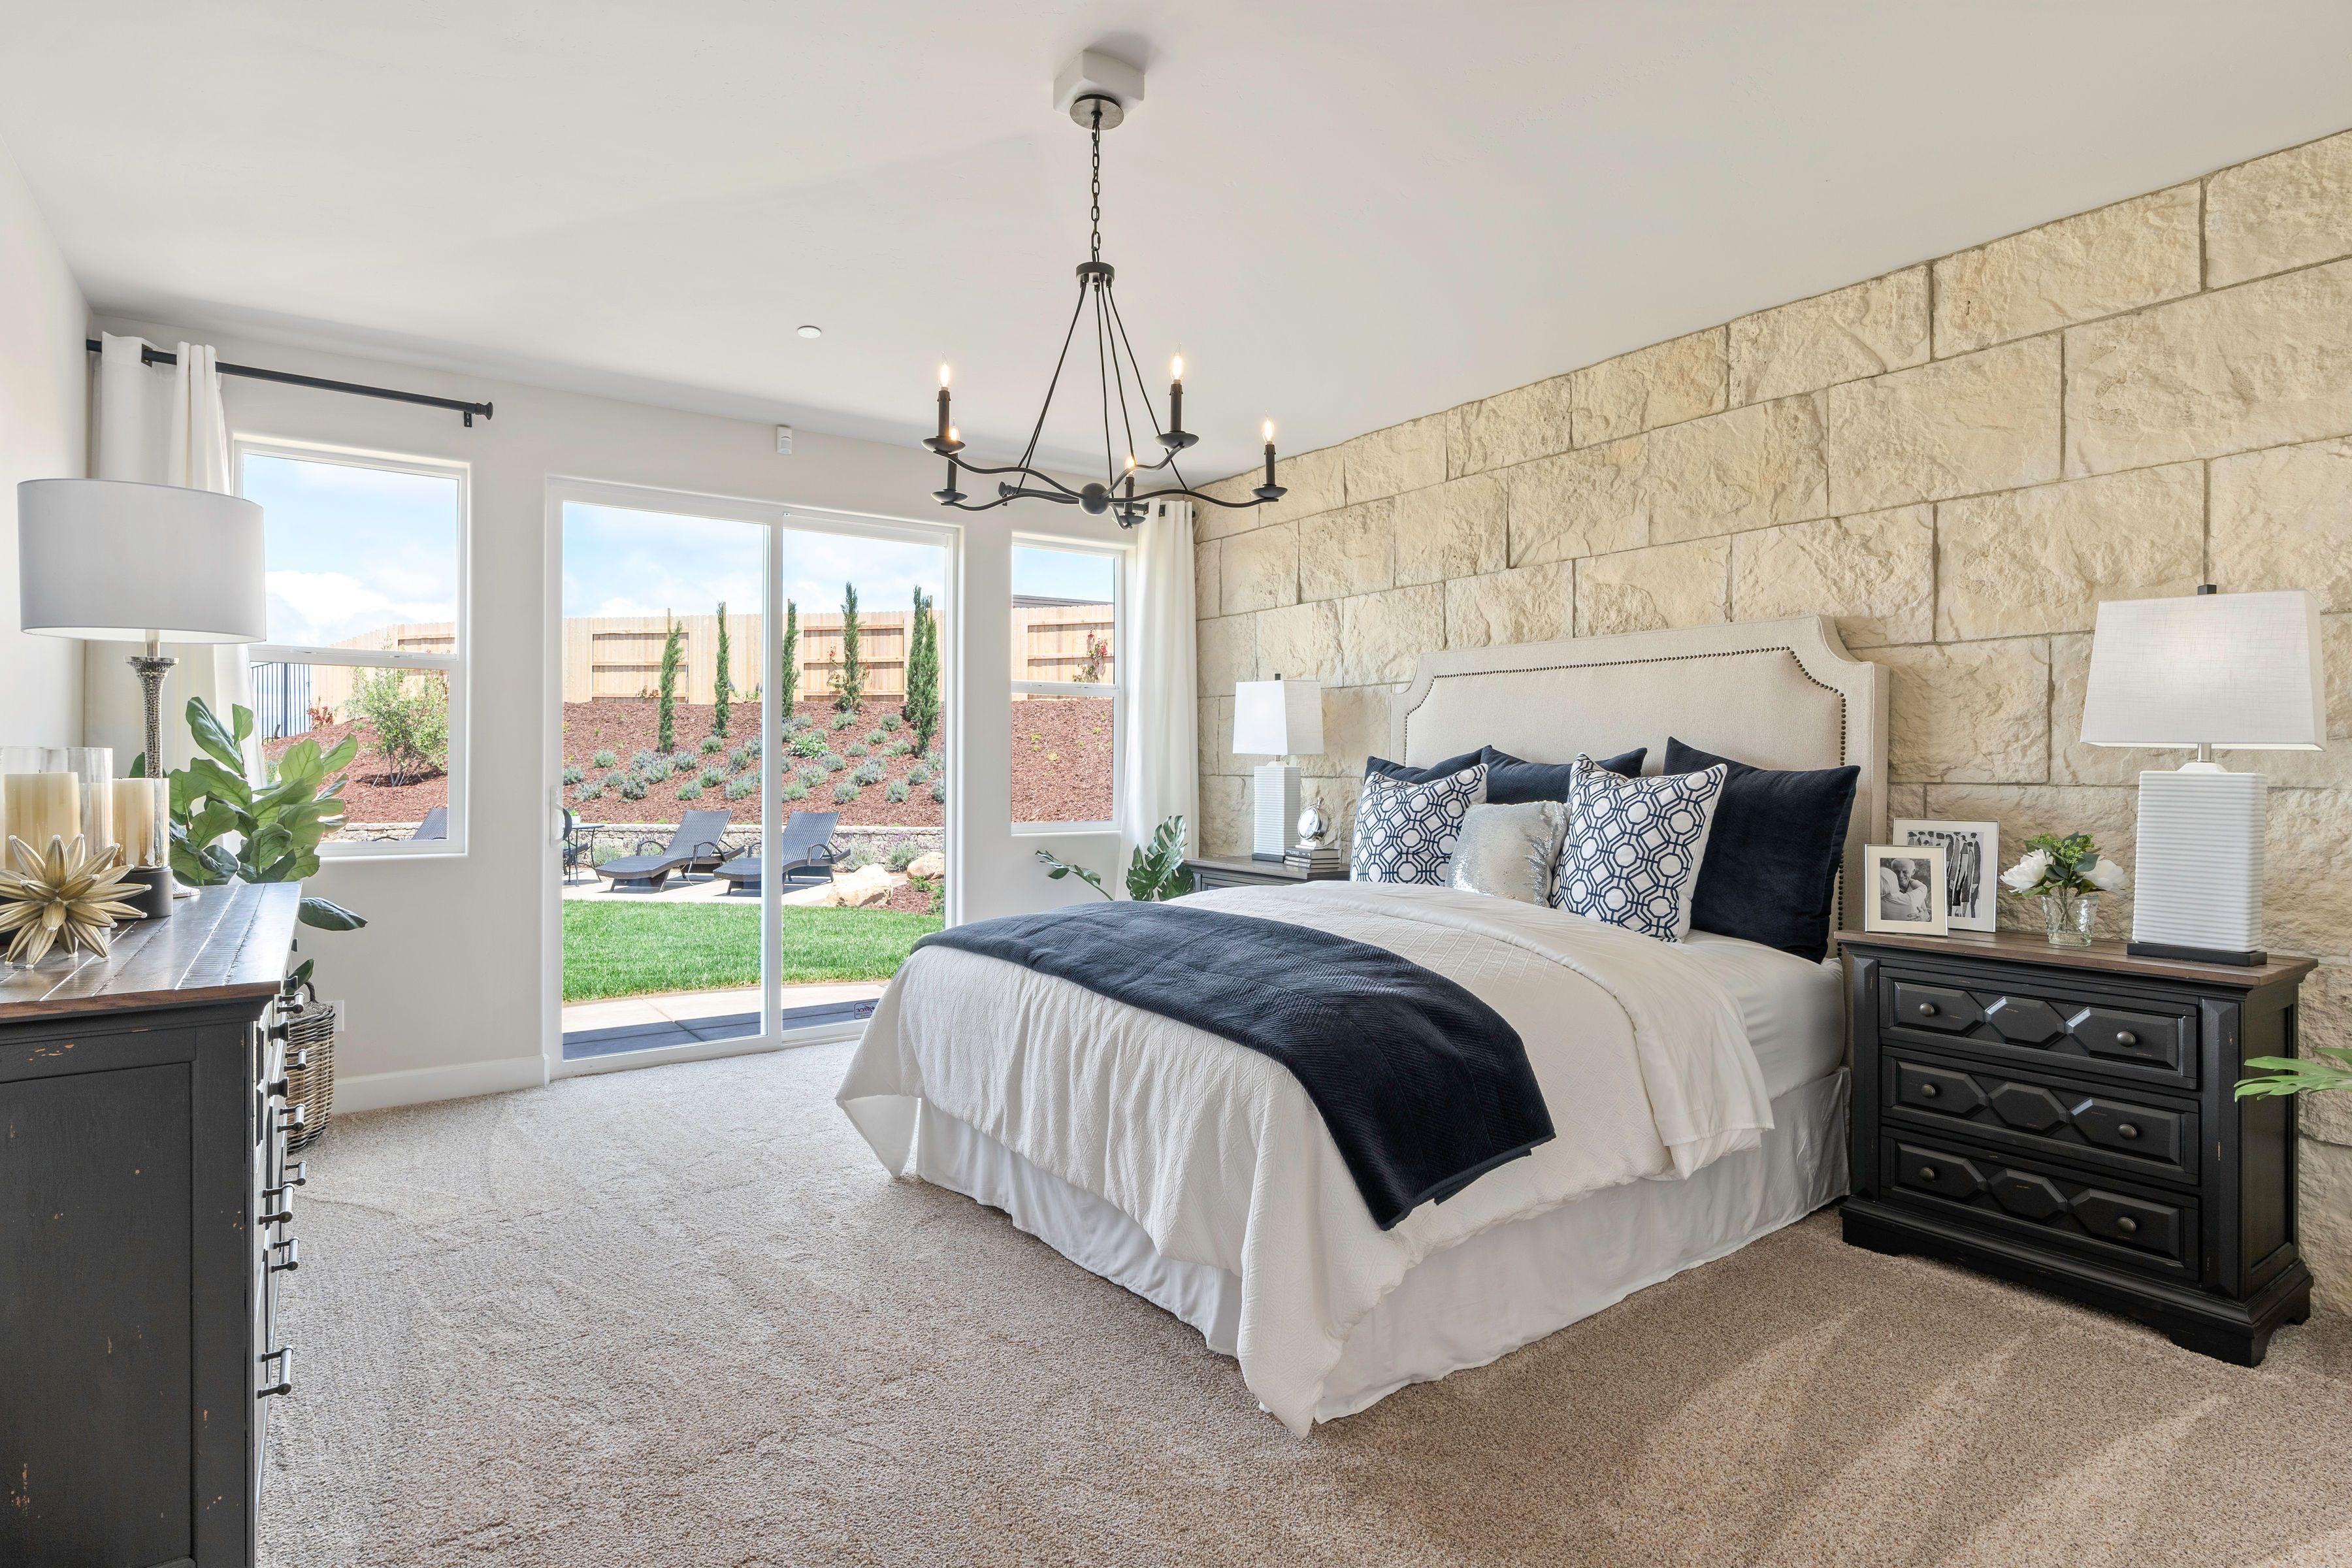 Bedroom featured in the Hillsboro By Coastal Community Builders in Santa Barbara, CA